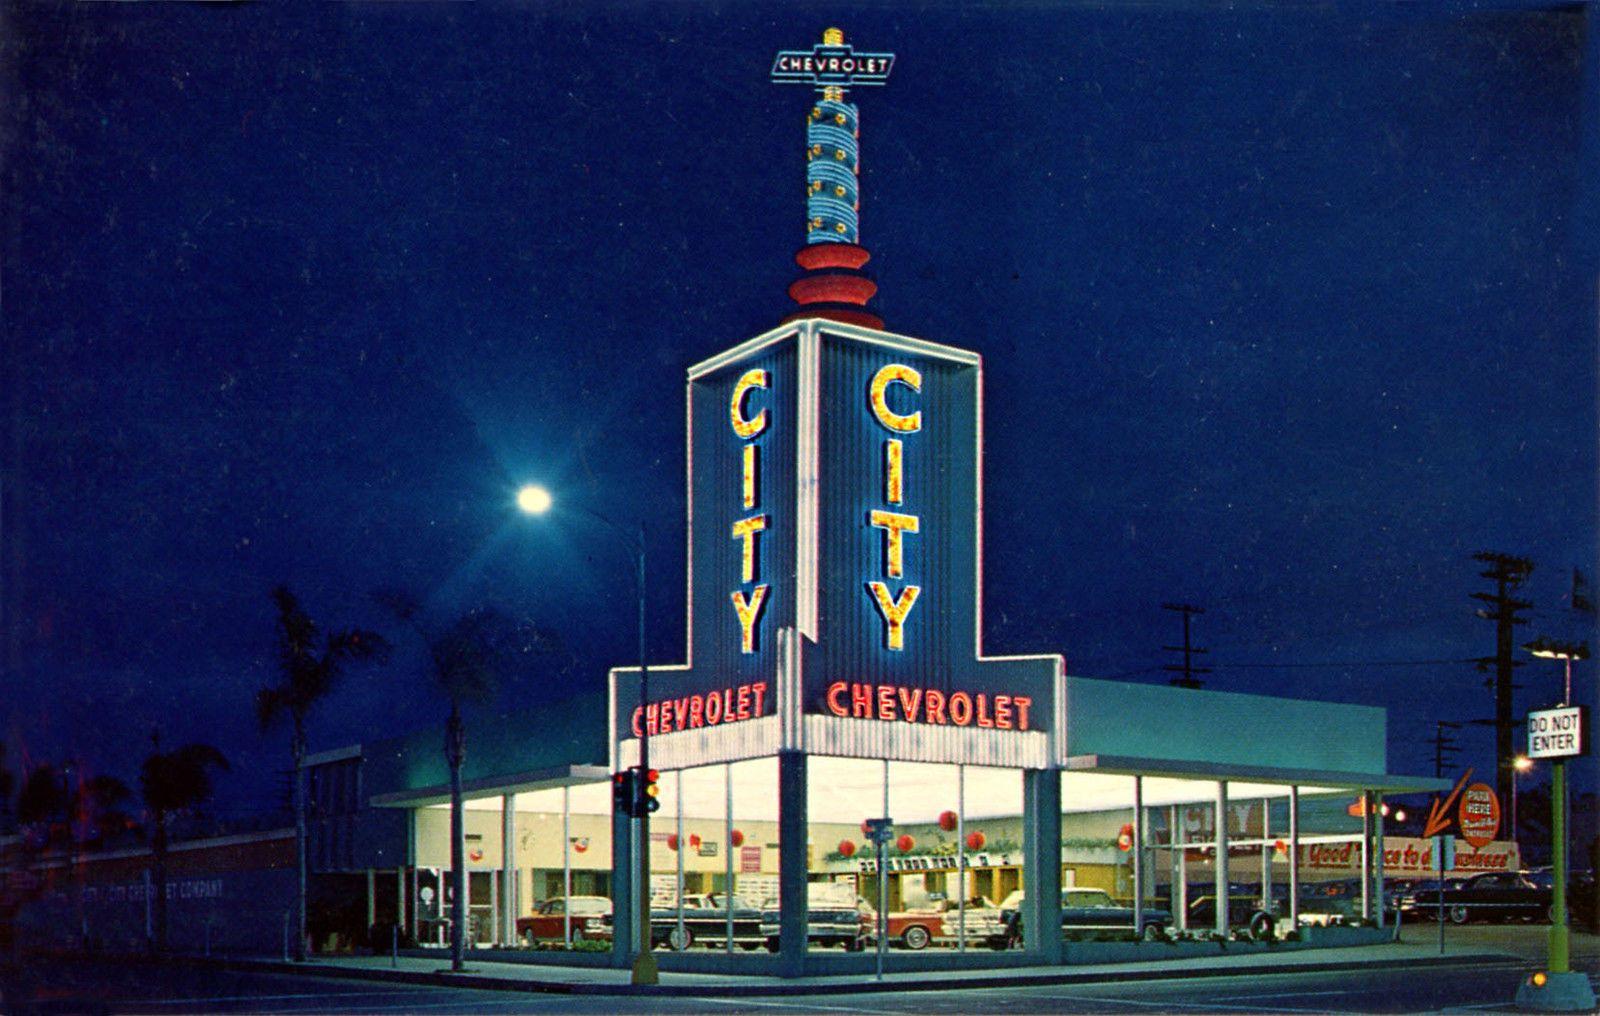 San Diego Ca City Chevrolet Dealership Located At Kettner Ash Photograph Chevrolet Dealership San Diego Chevrolet